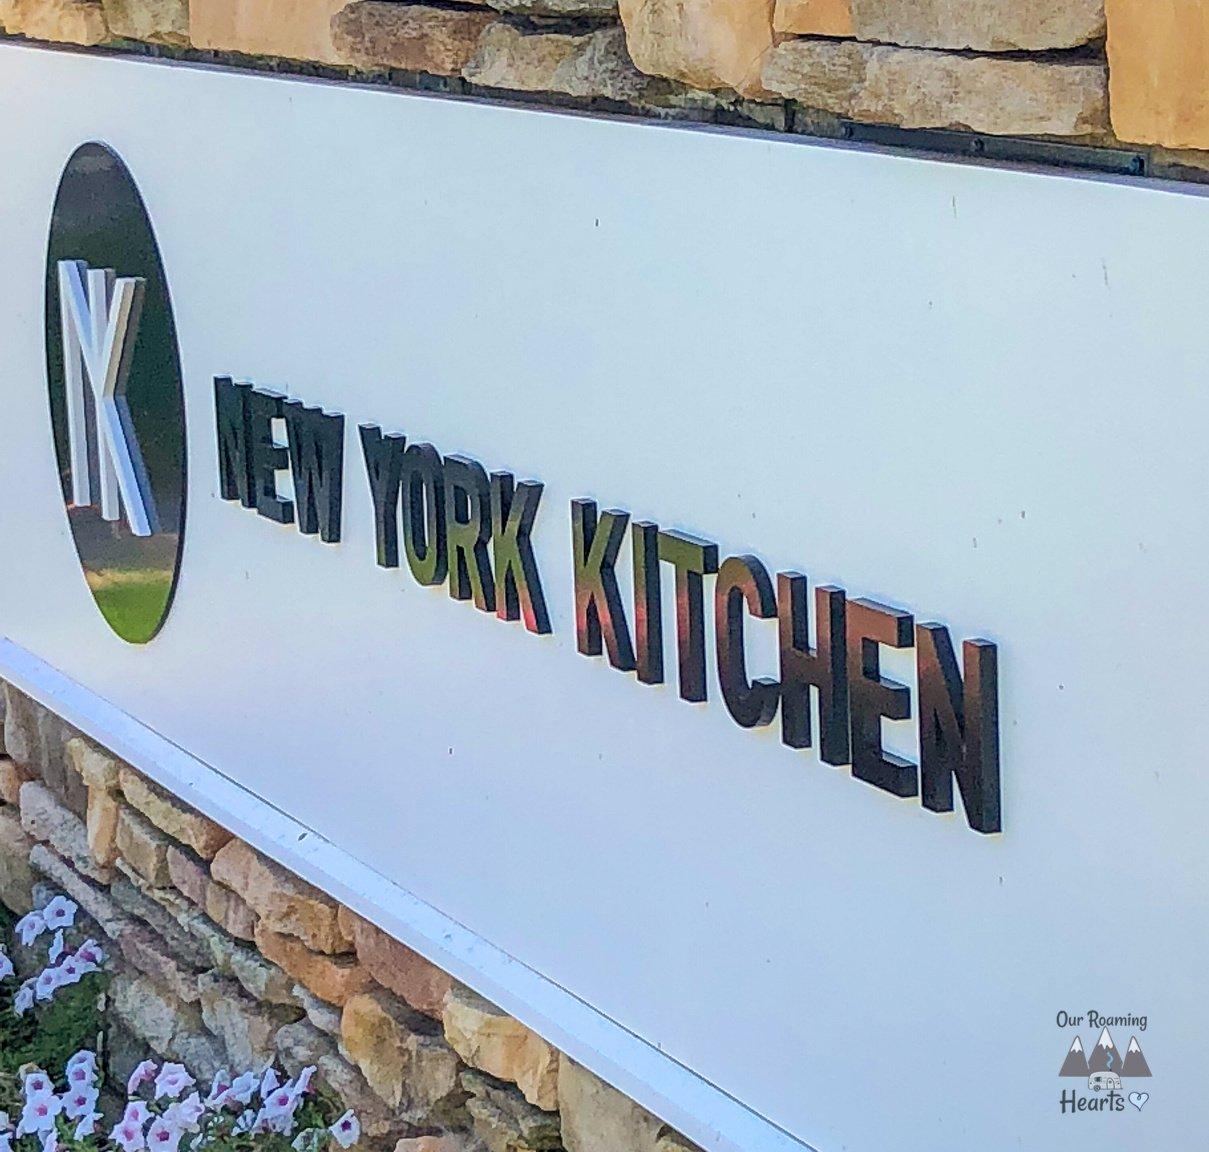 The New York Kitchen